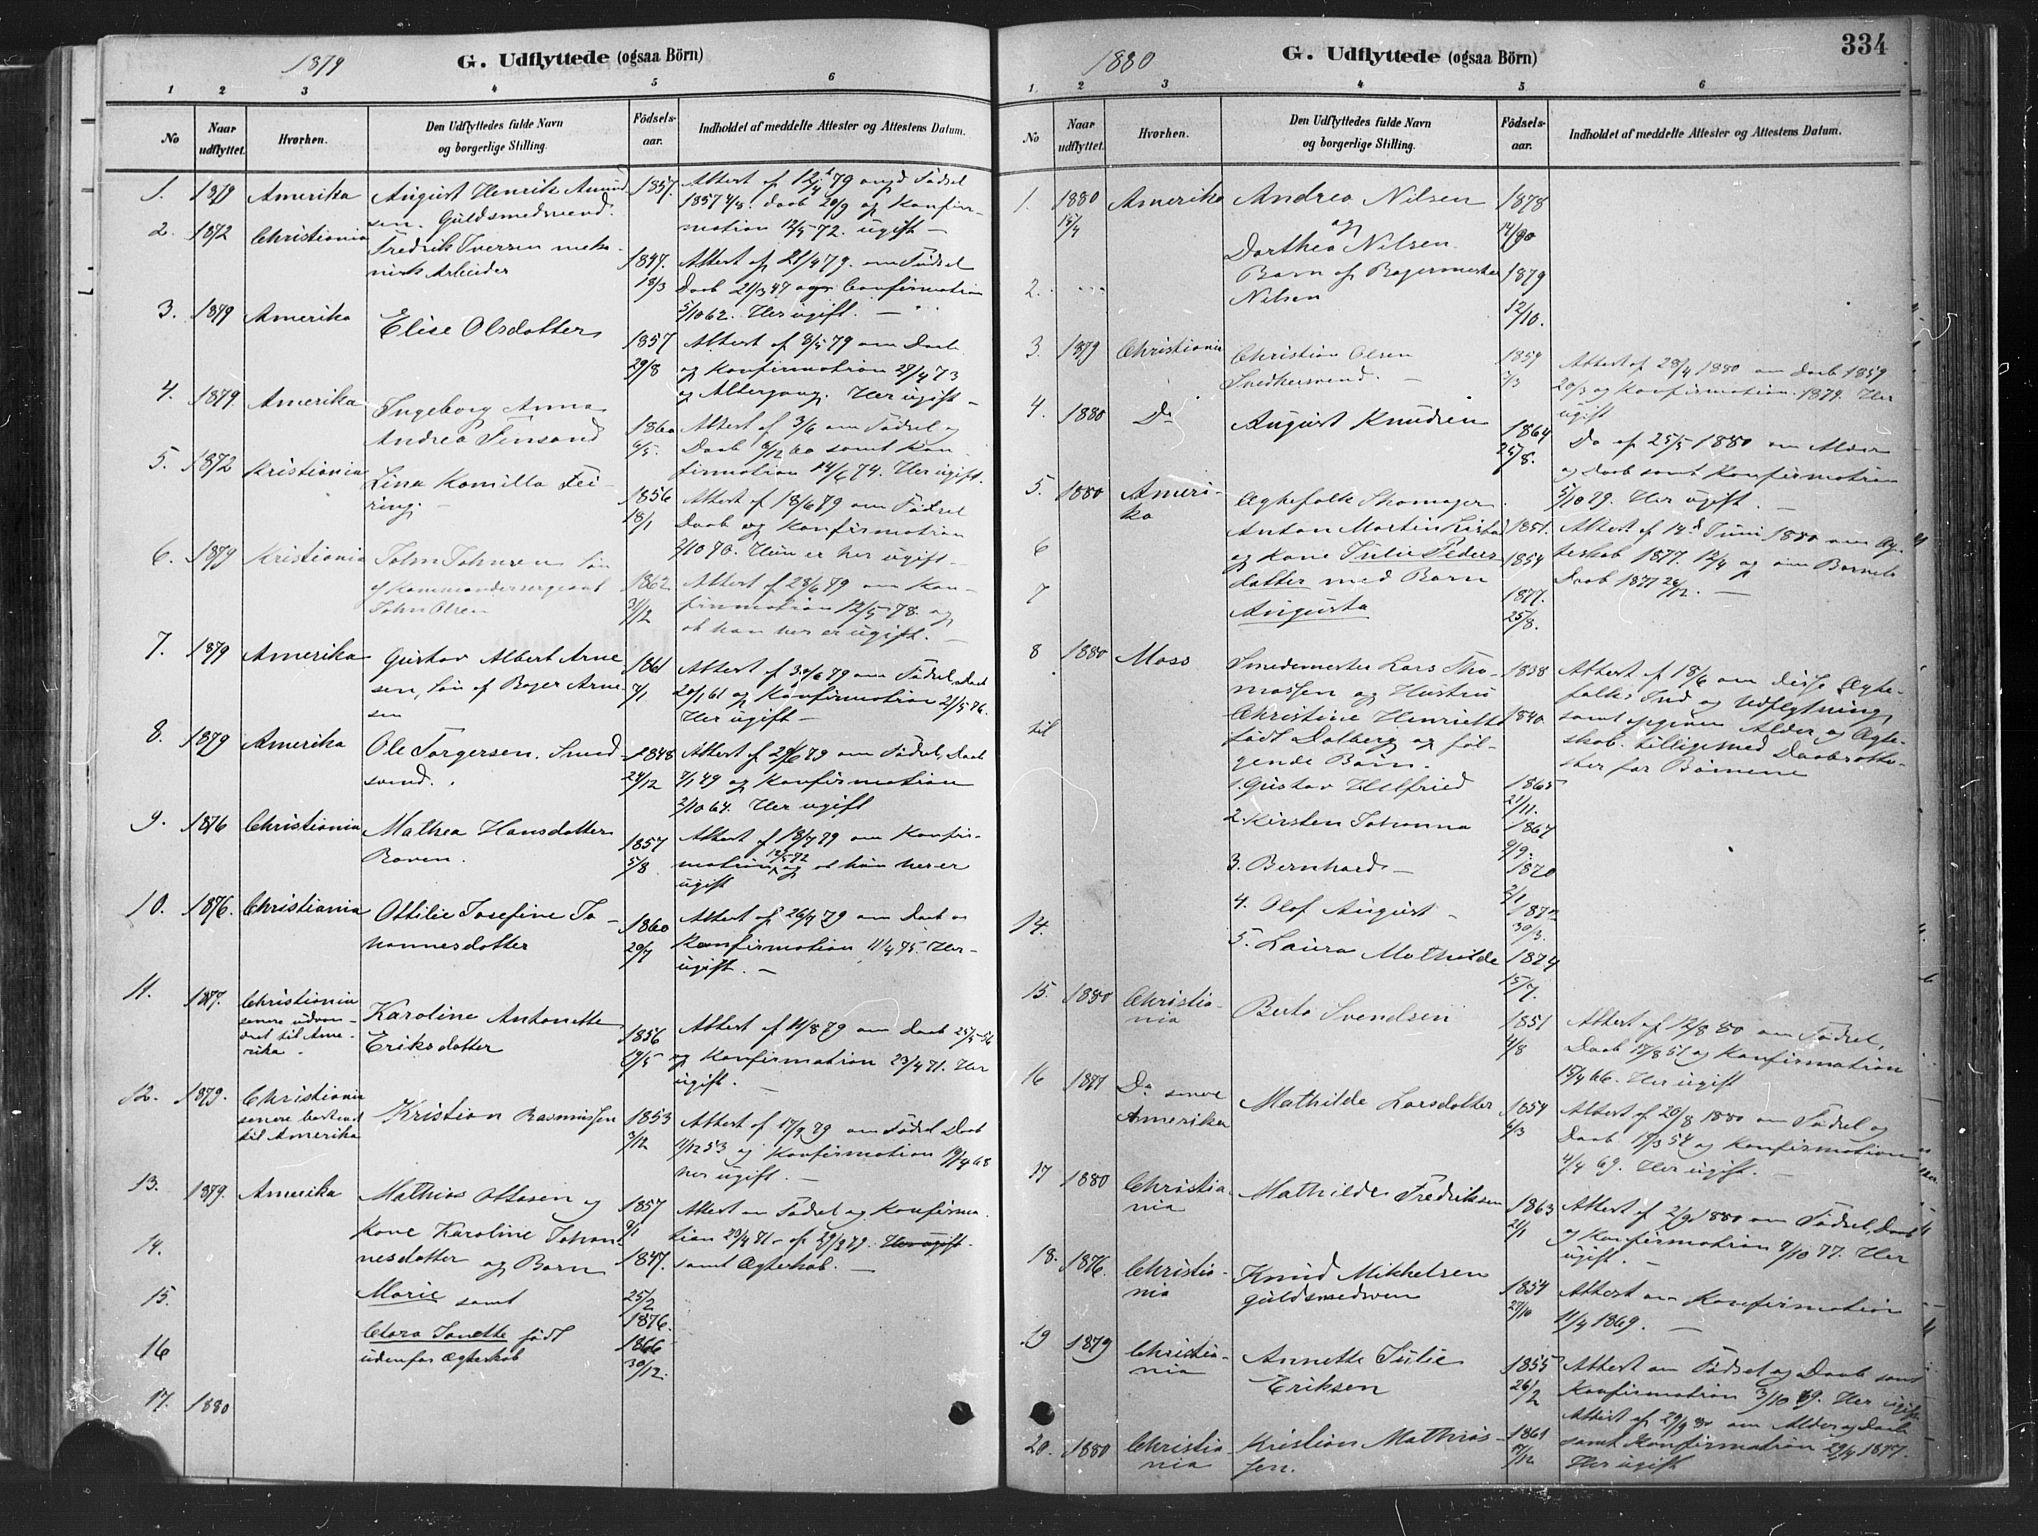 SAH, Fåberg prestekontor, H/Ha/Haa/L0010: Ministerialbok nr. 10, 1879-1900, s. 334